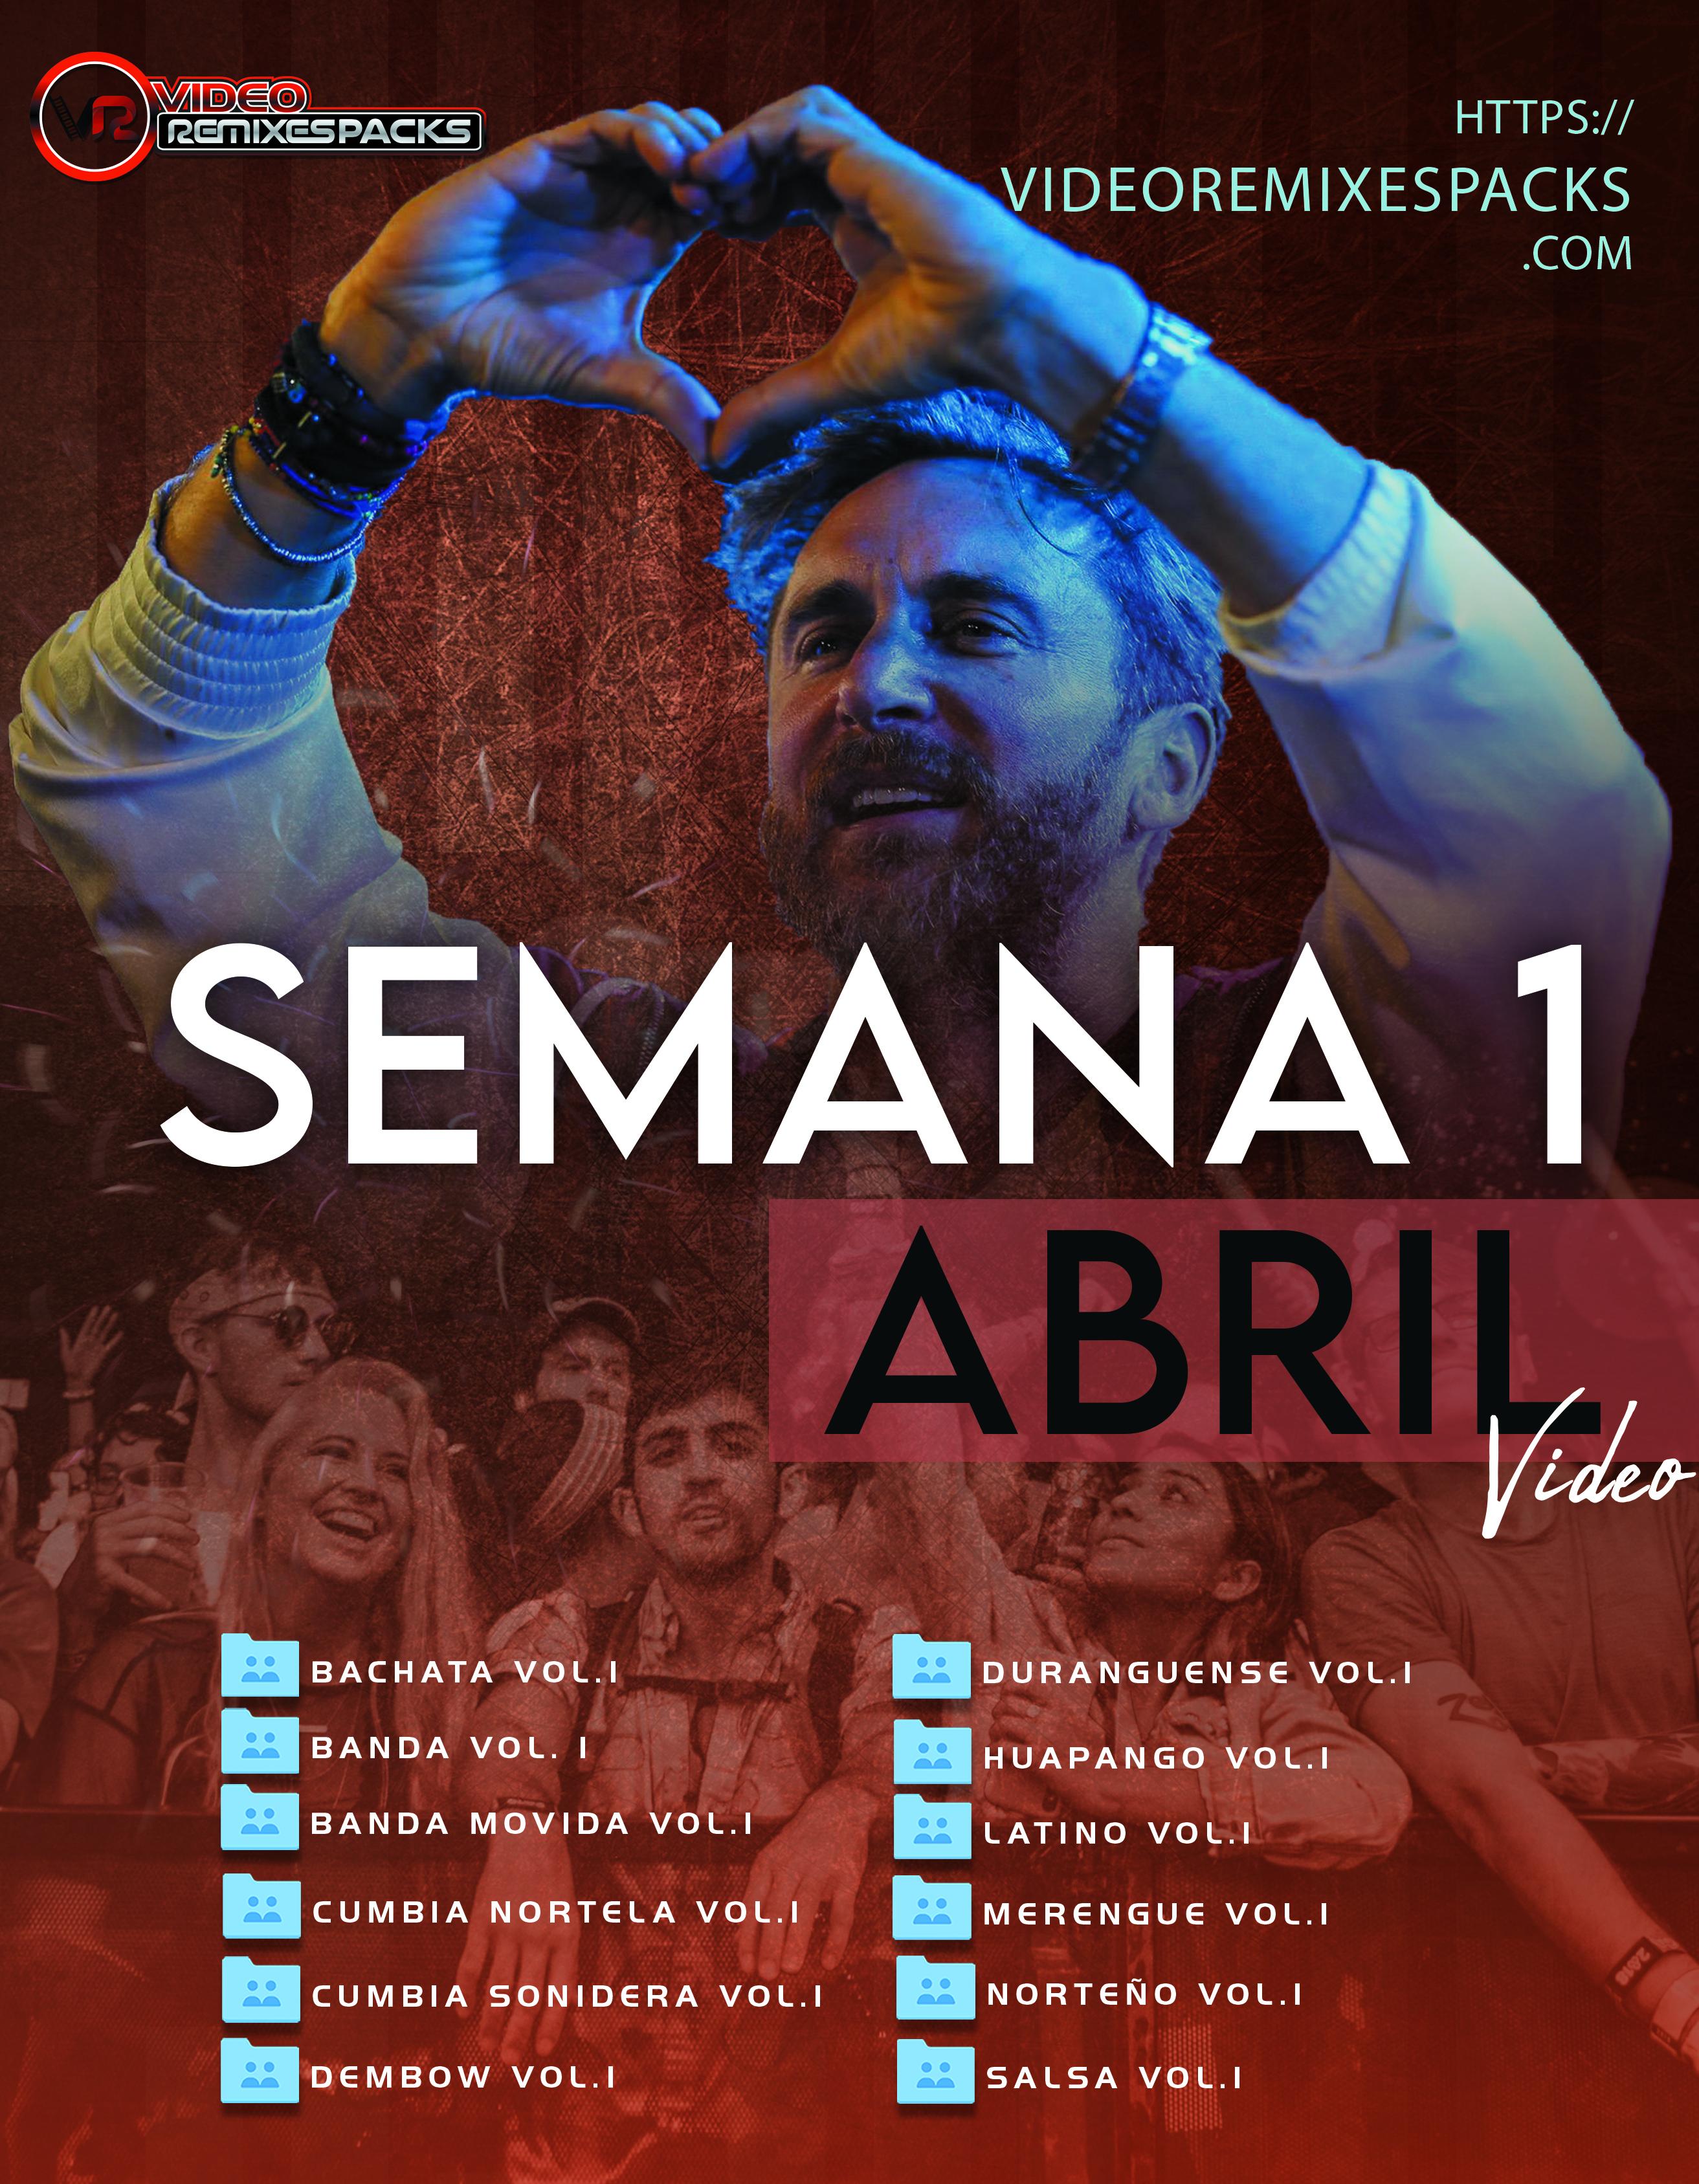 Imagen de Remixes Latinos Abril Video